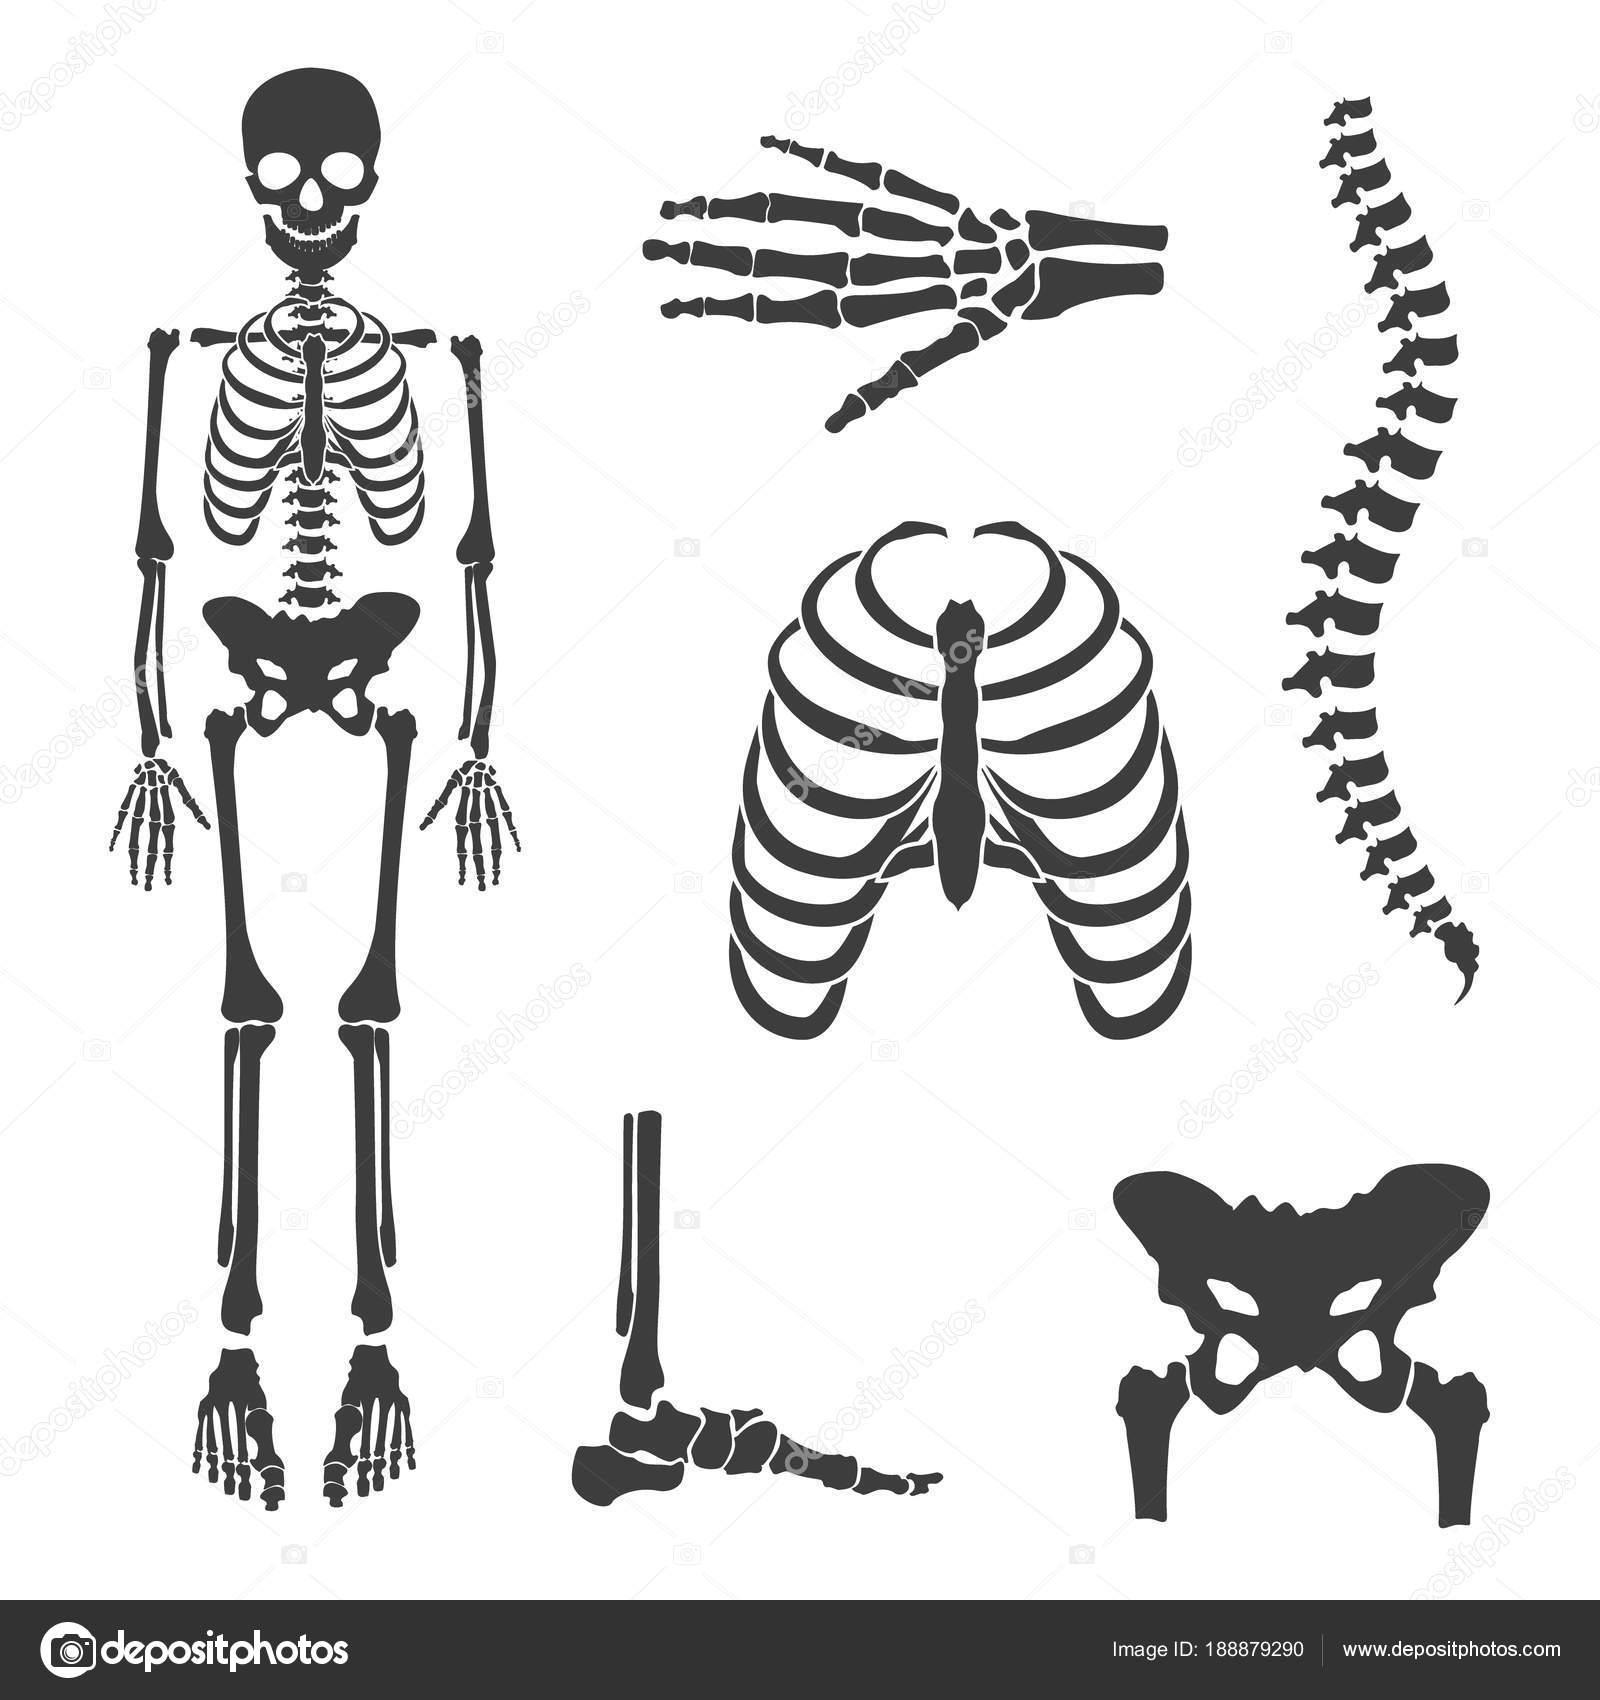 Menschliches Skelett raster — Stockfoto © viktorijareut #188879290